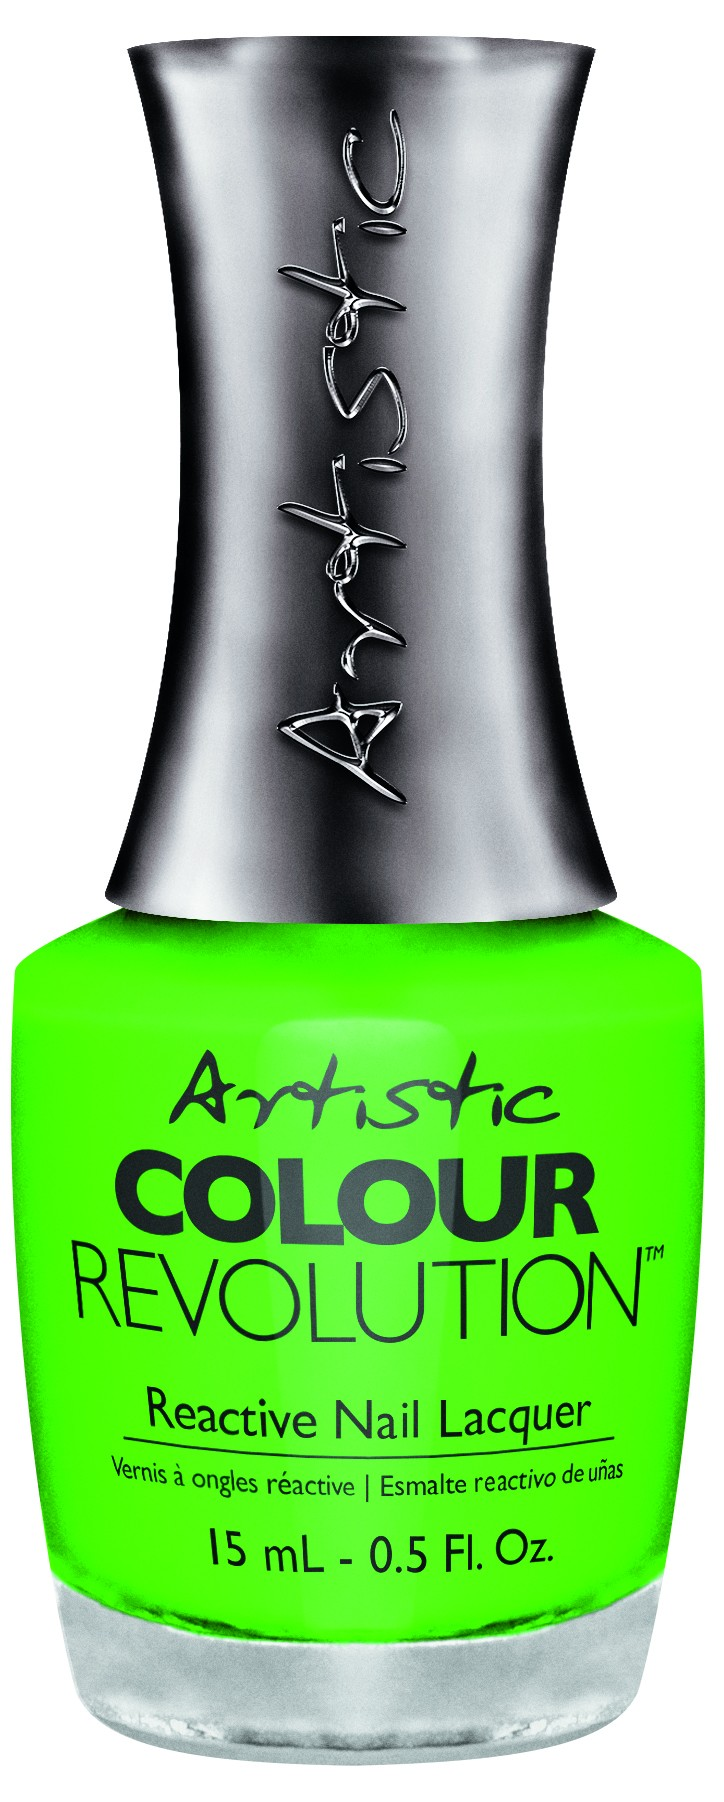 Artistic Oja Hibrid Revolution -Toxic- Verde